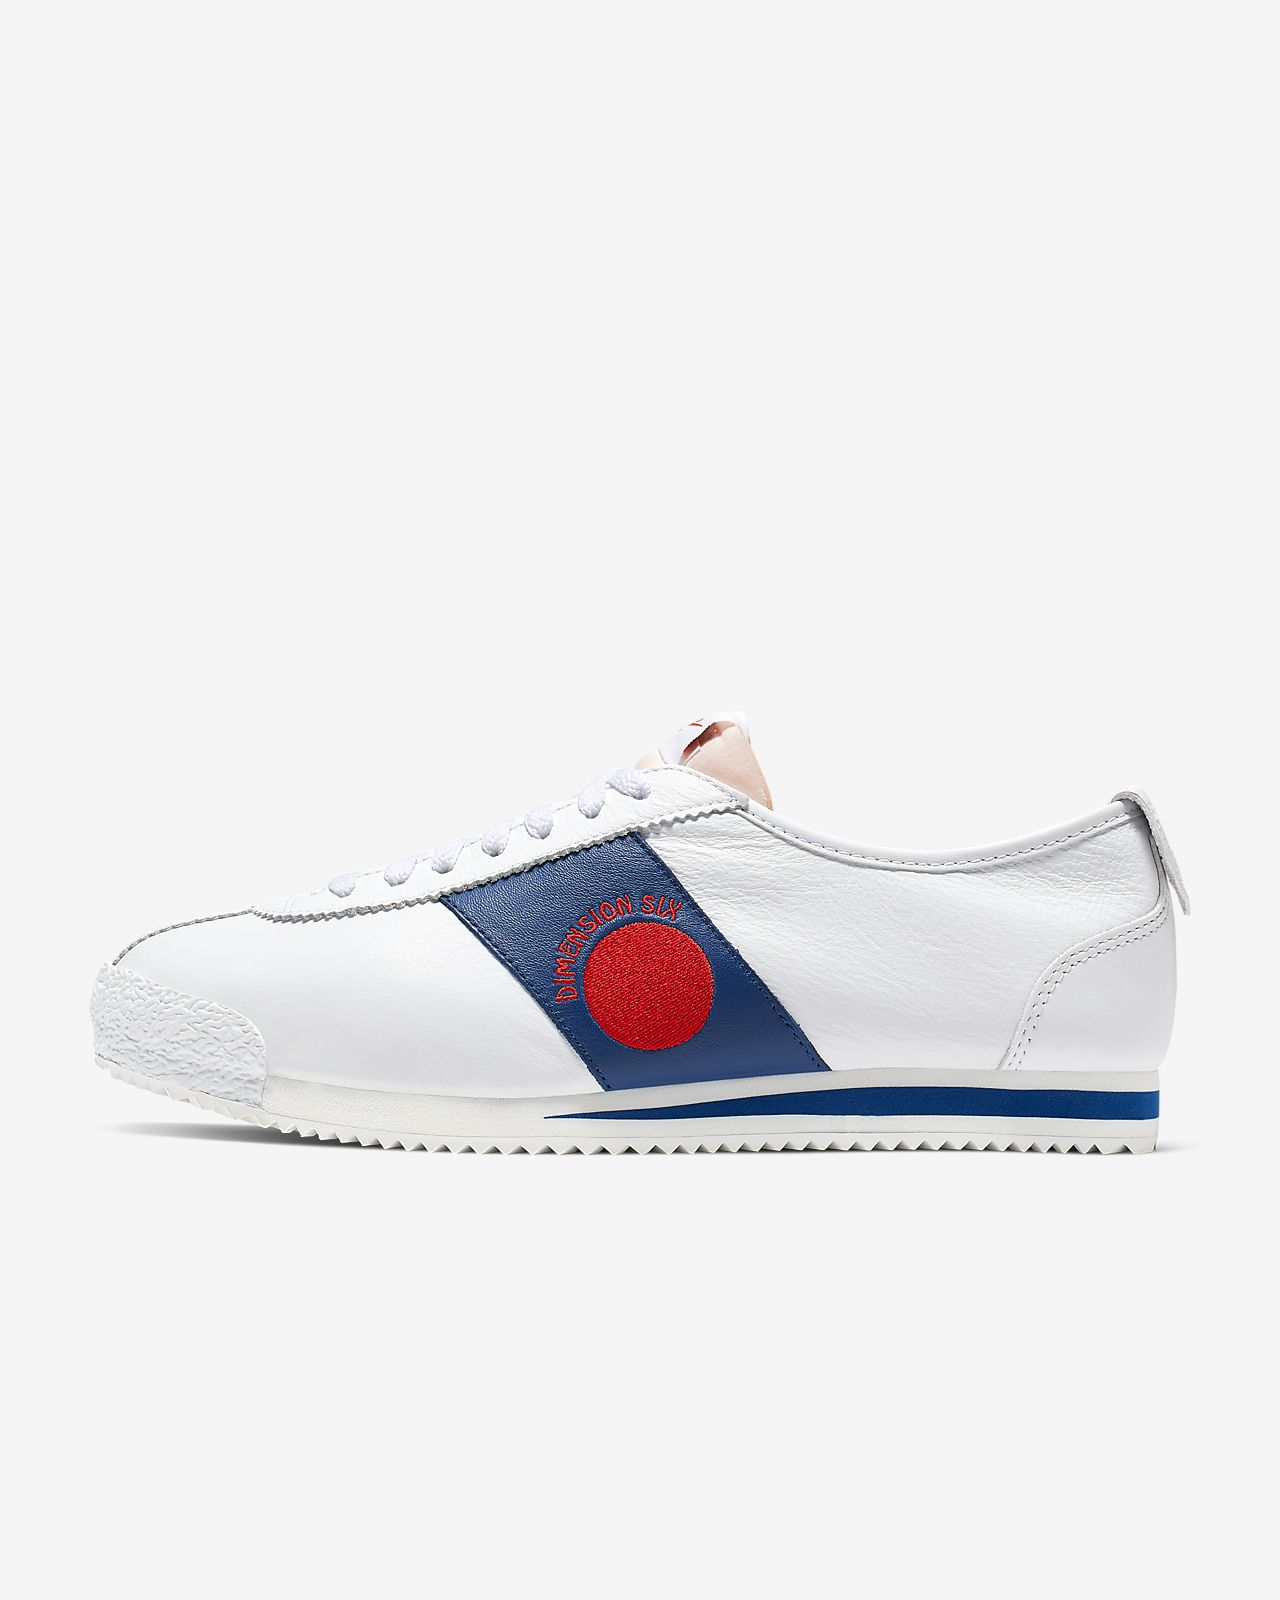 Nike Cortez '72 S.D. 男鞋